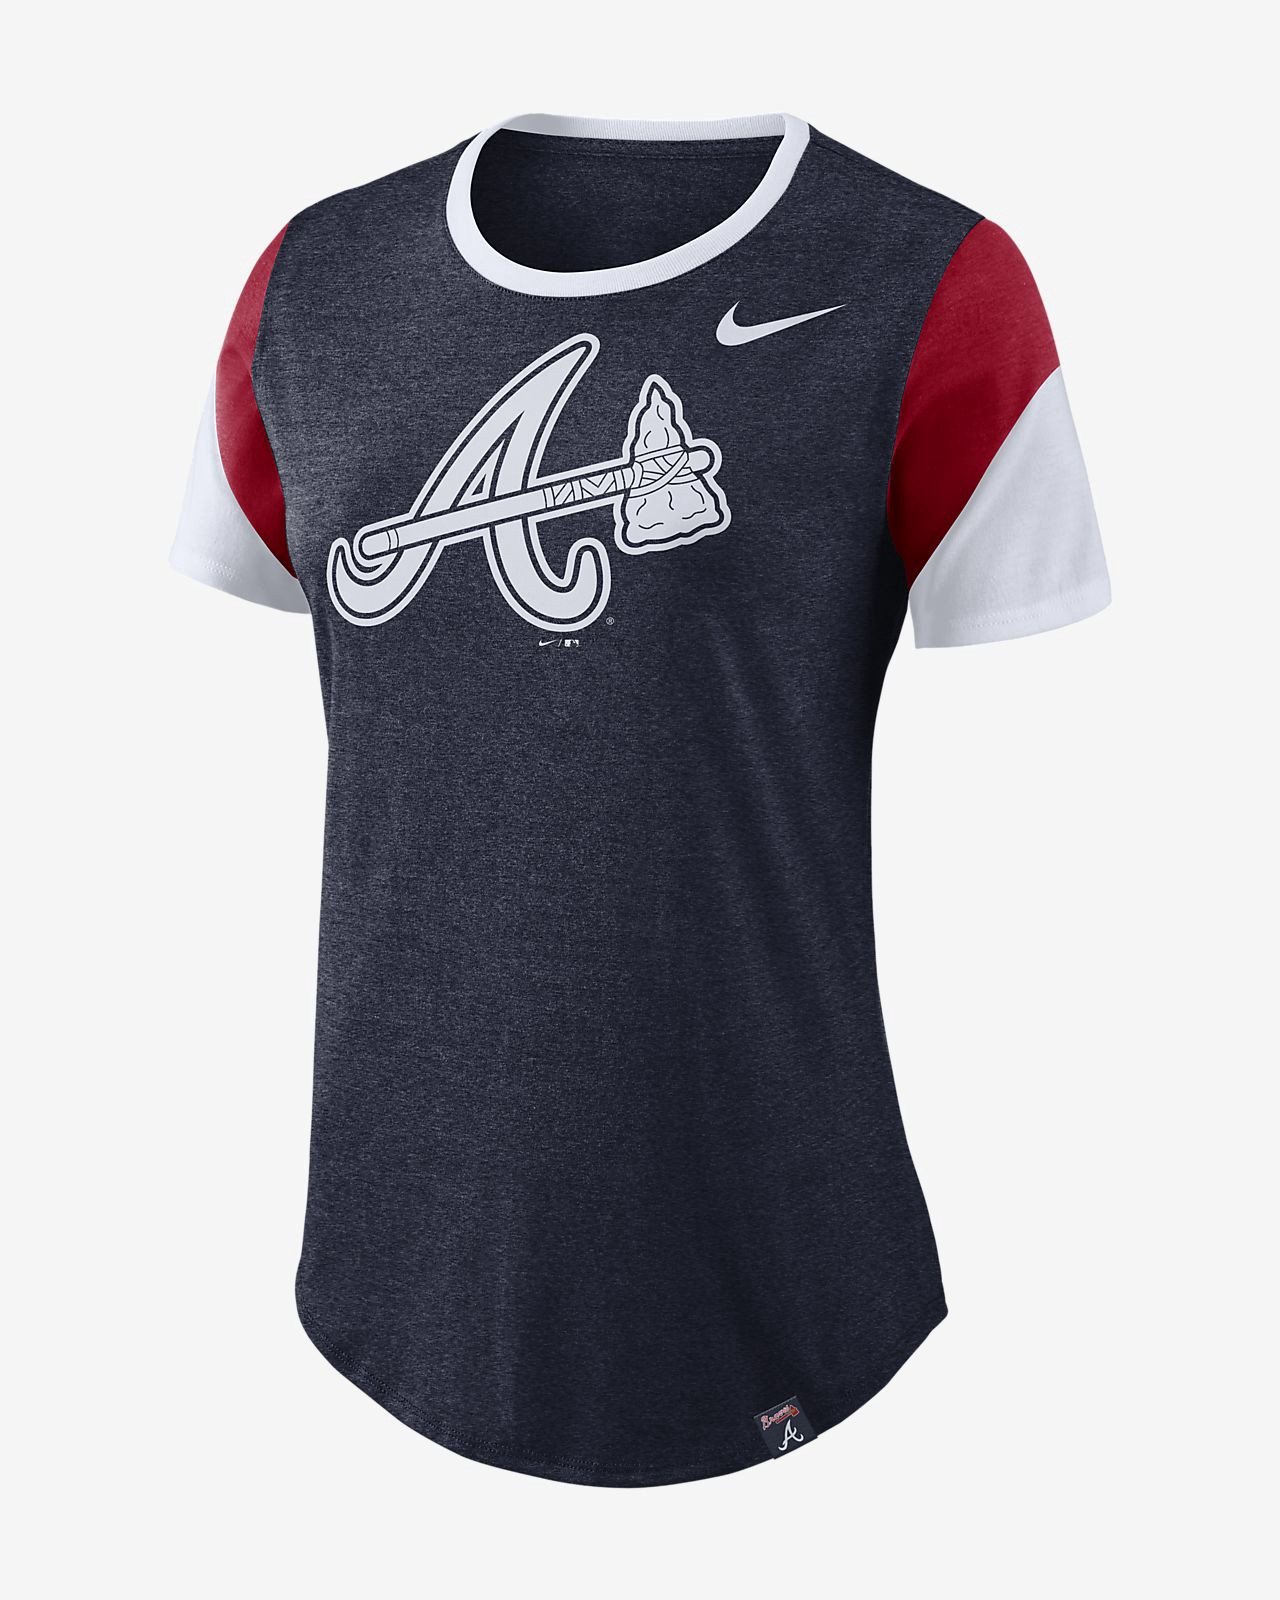 Nike Tri Blend Mlb Braves Women S T Shirt Xl Navy Color Block Tee Nike Women T Shirts For Women